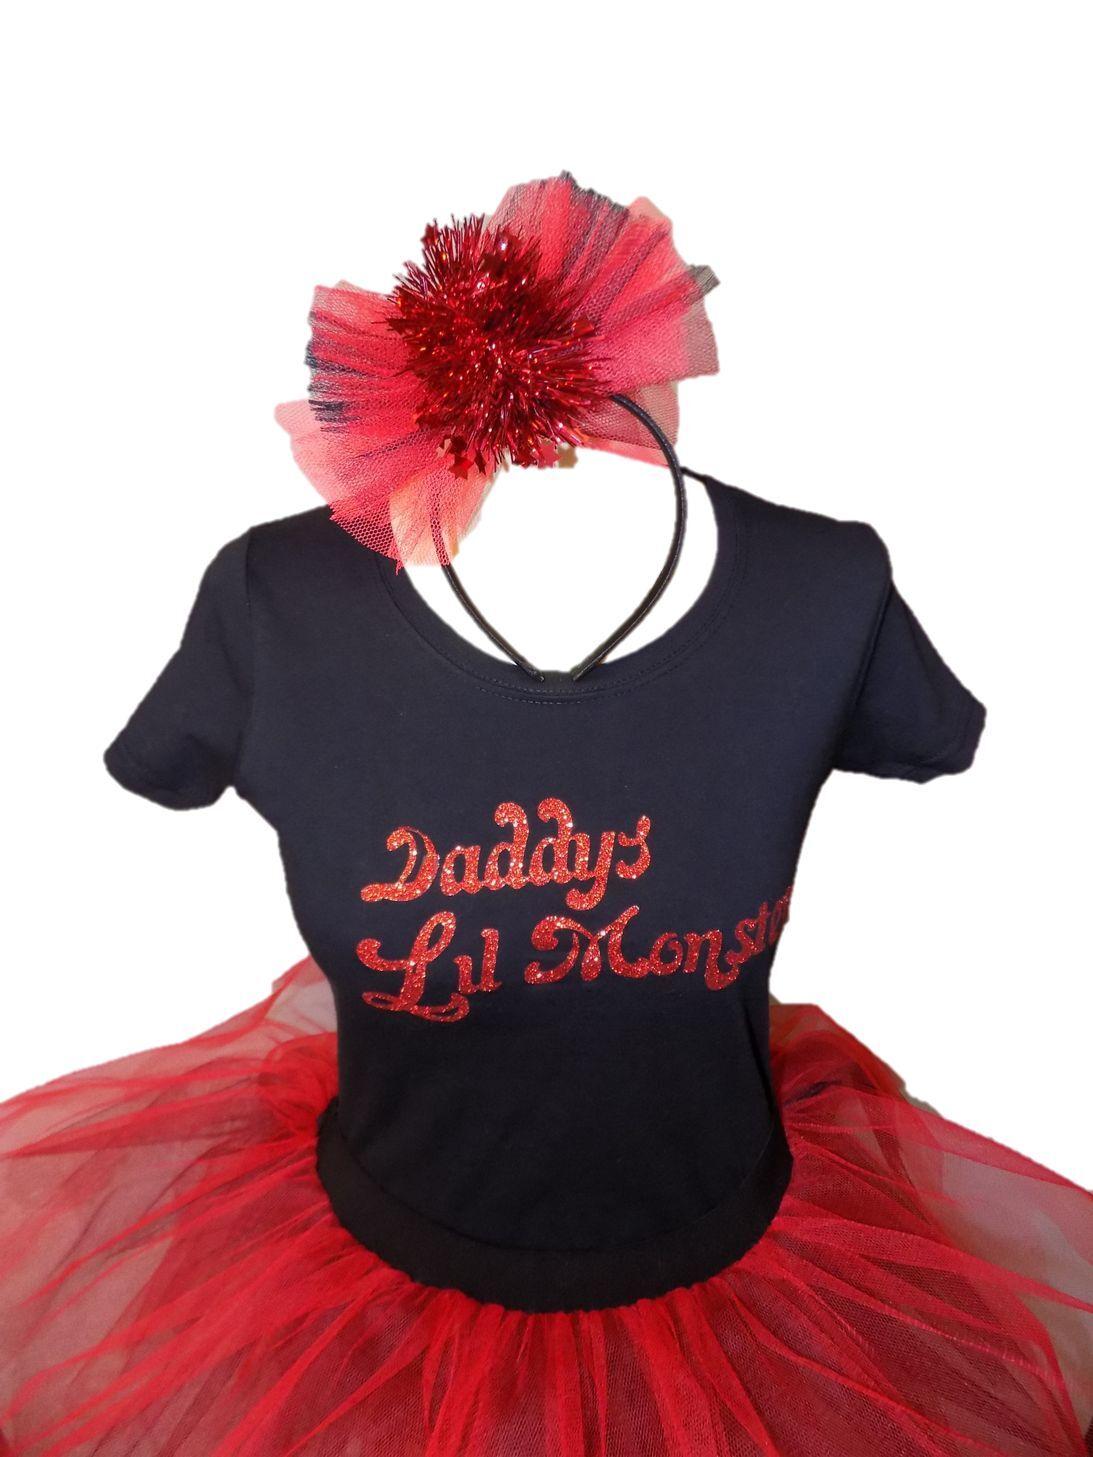 Daddys Lil Monster Halloween Neon Tutu Set Harley Quinn